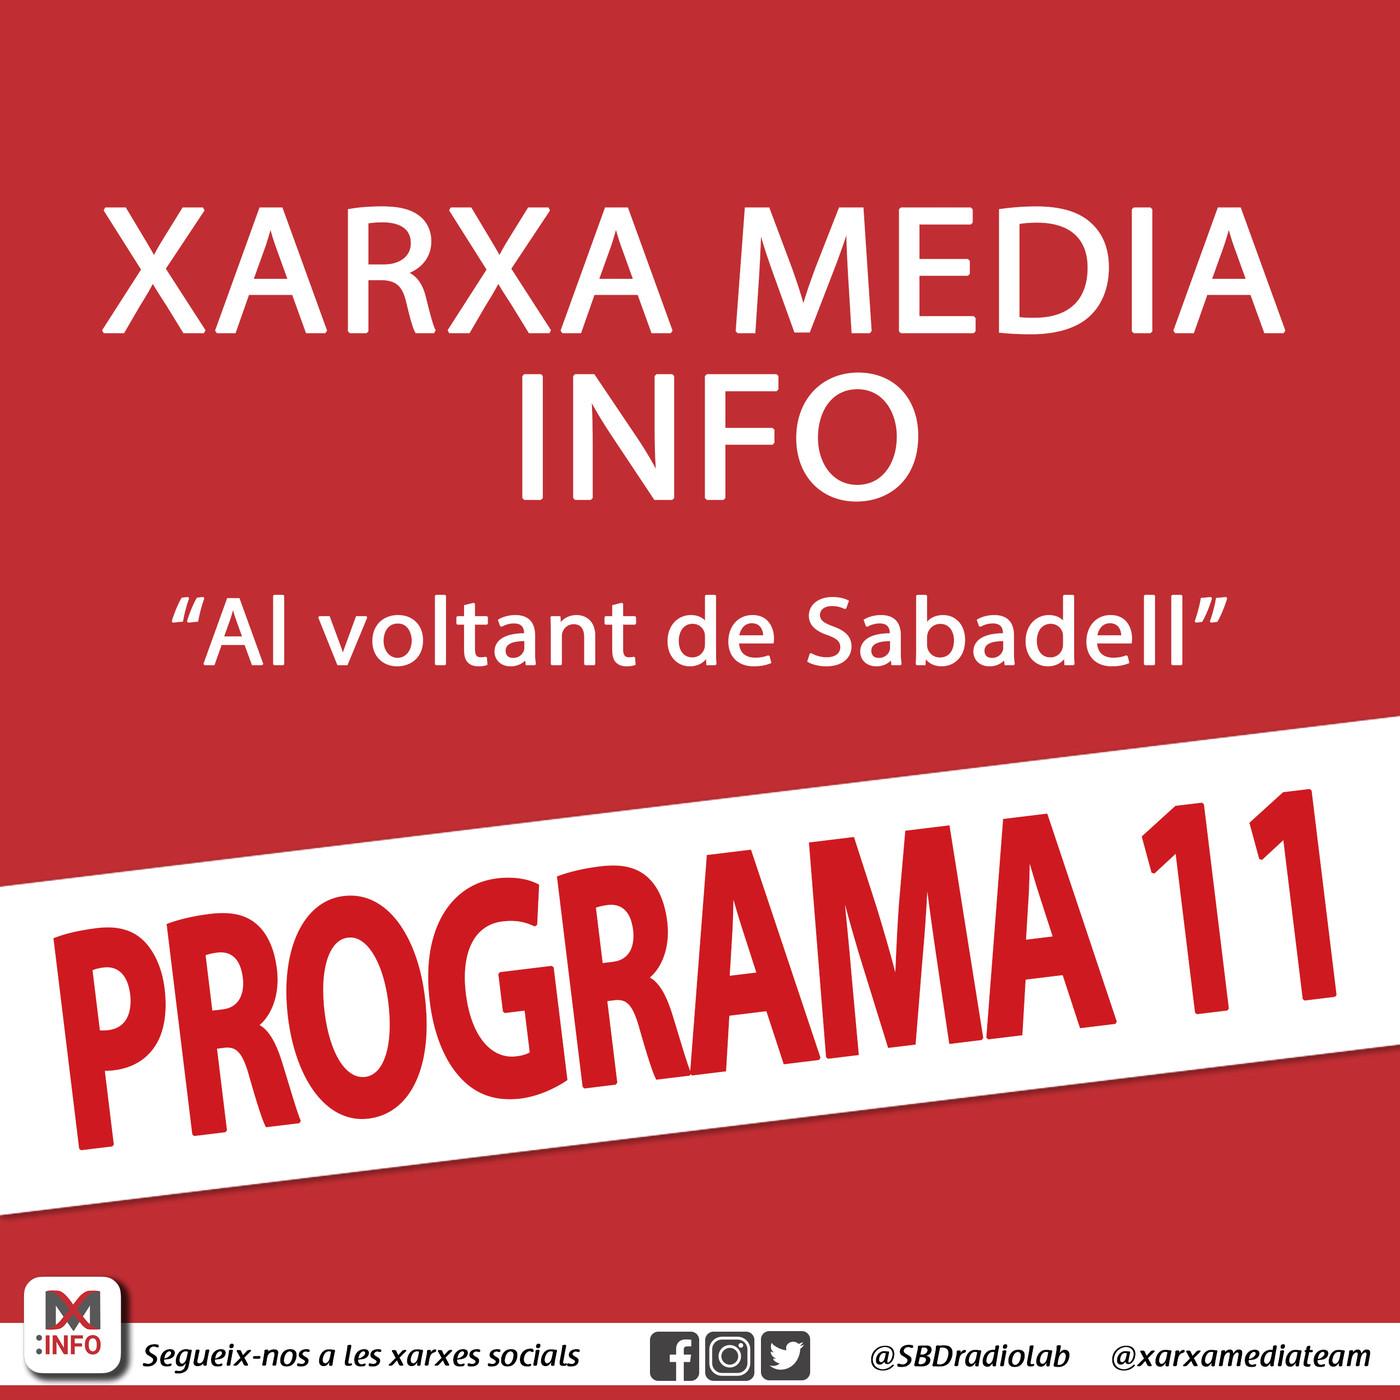 Xarxa Media Info